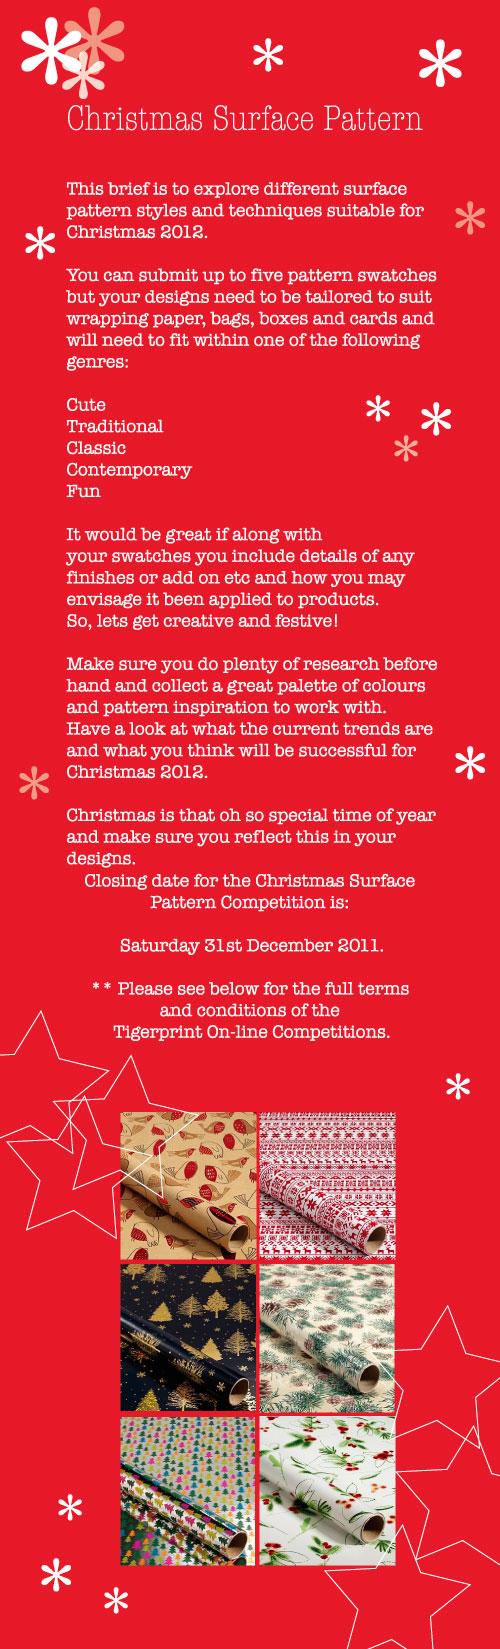 Christmas-Surface-Pattern-2012